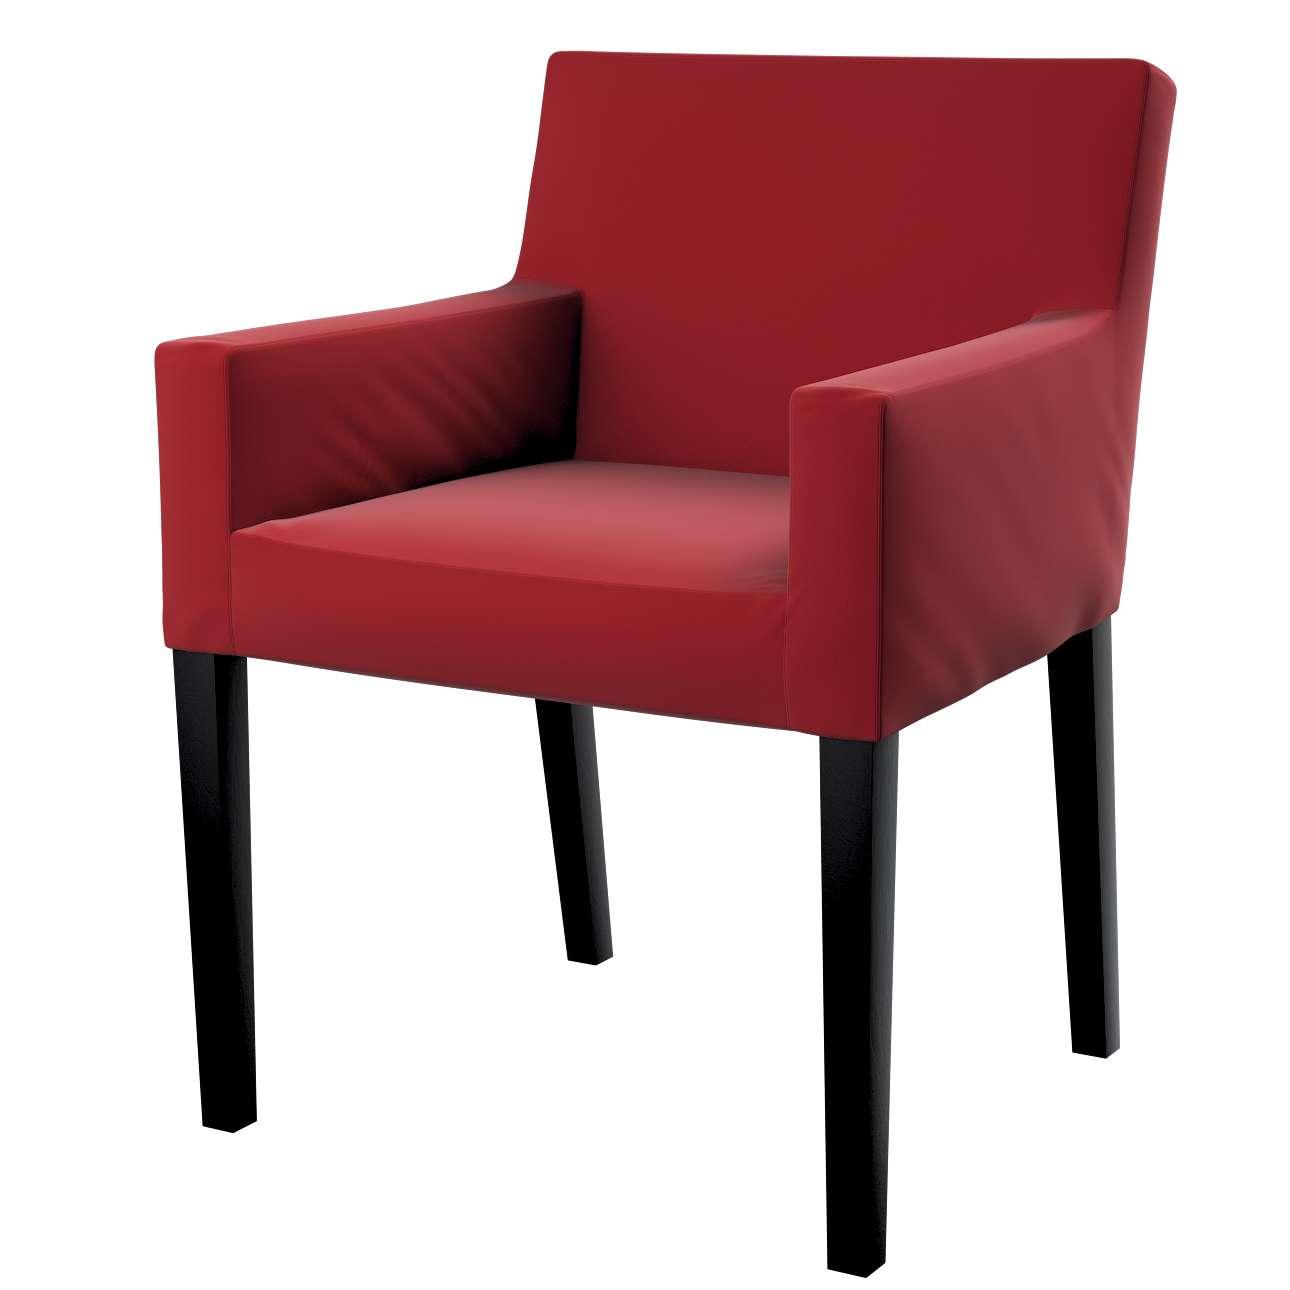 Návlek na stoličku s opierkami Nils V kolekcii Velvet, tkanina: 704-15